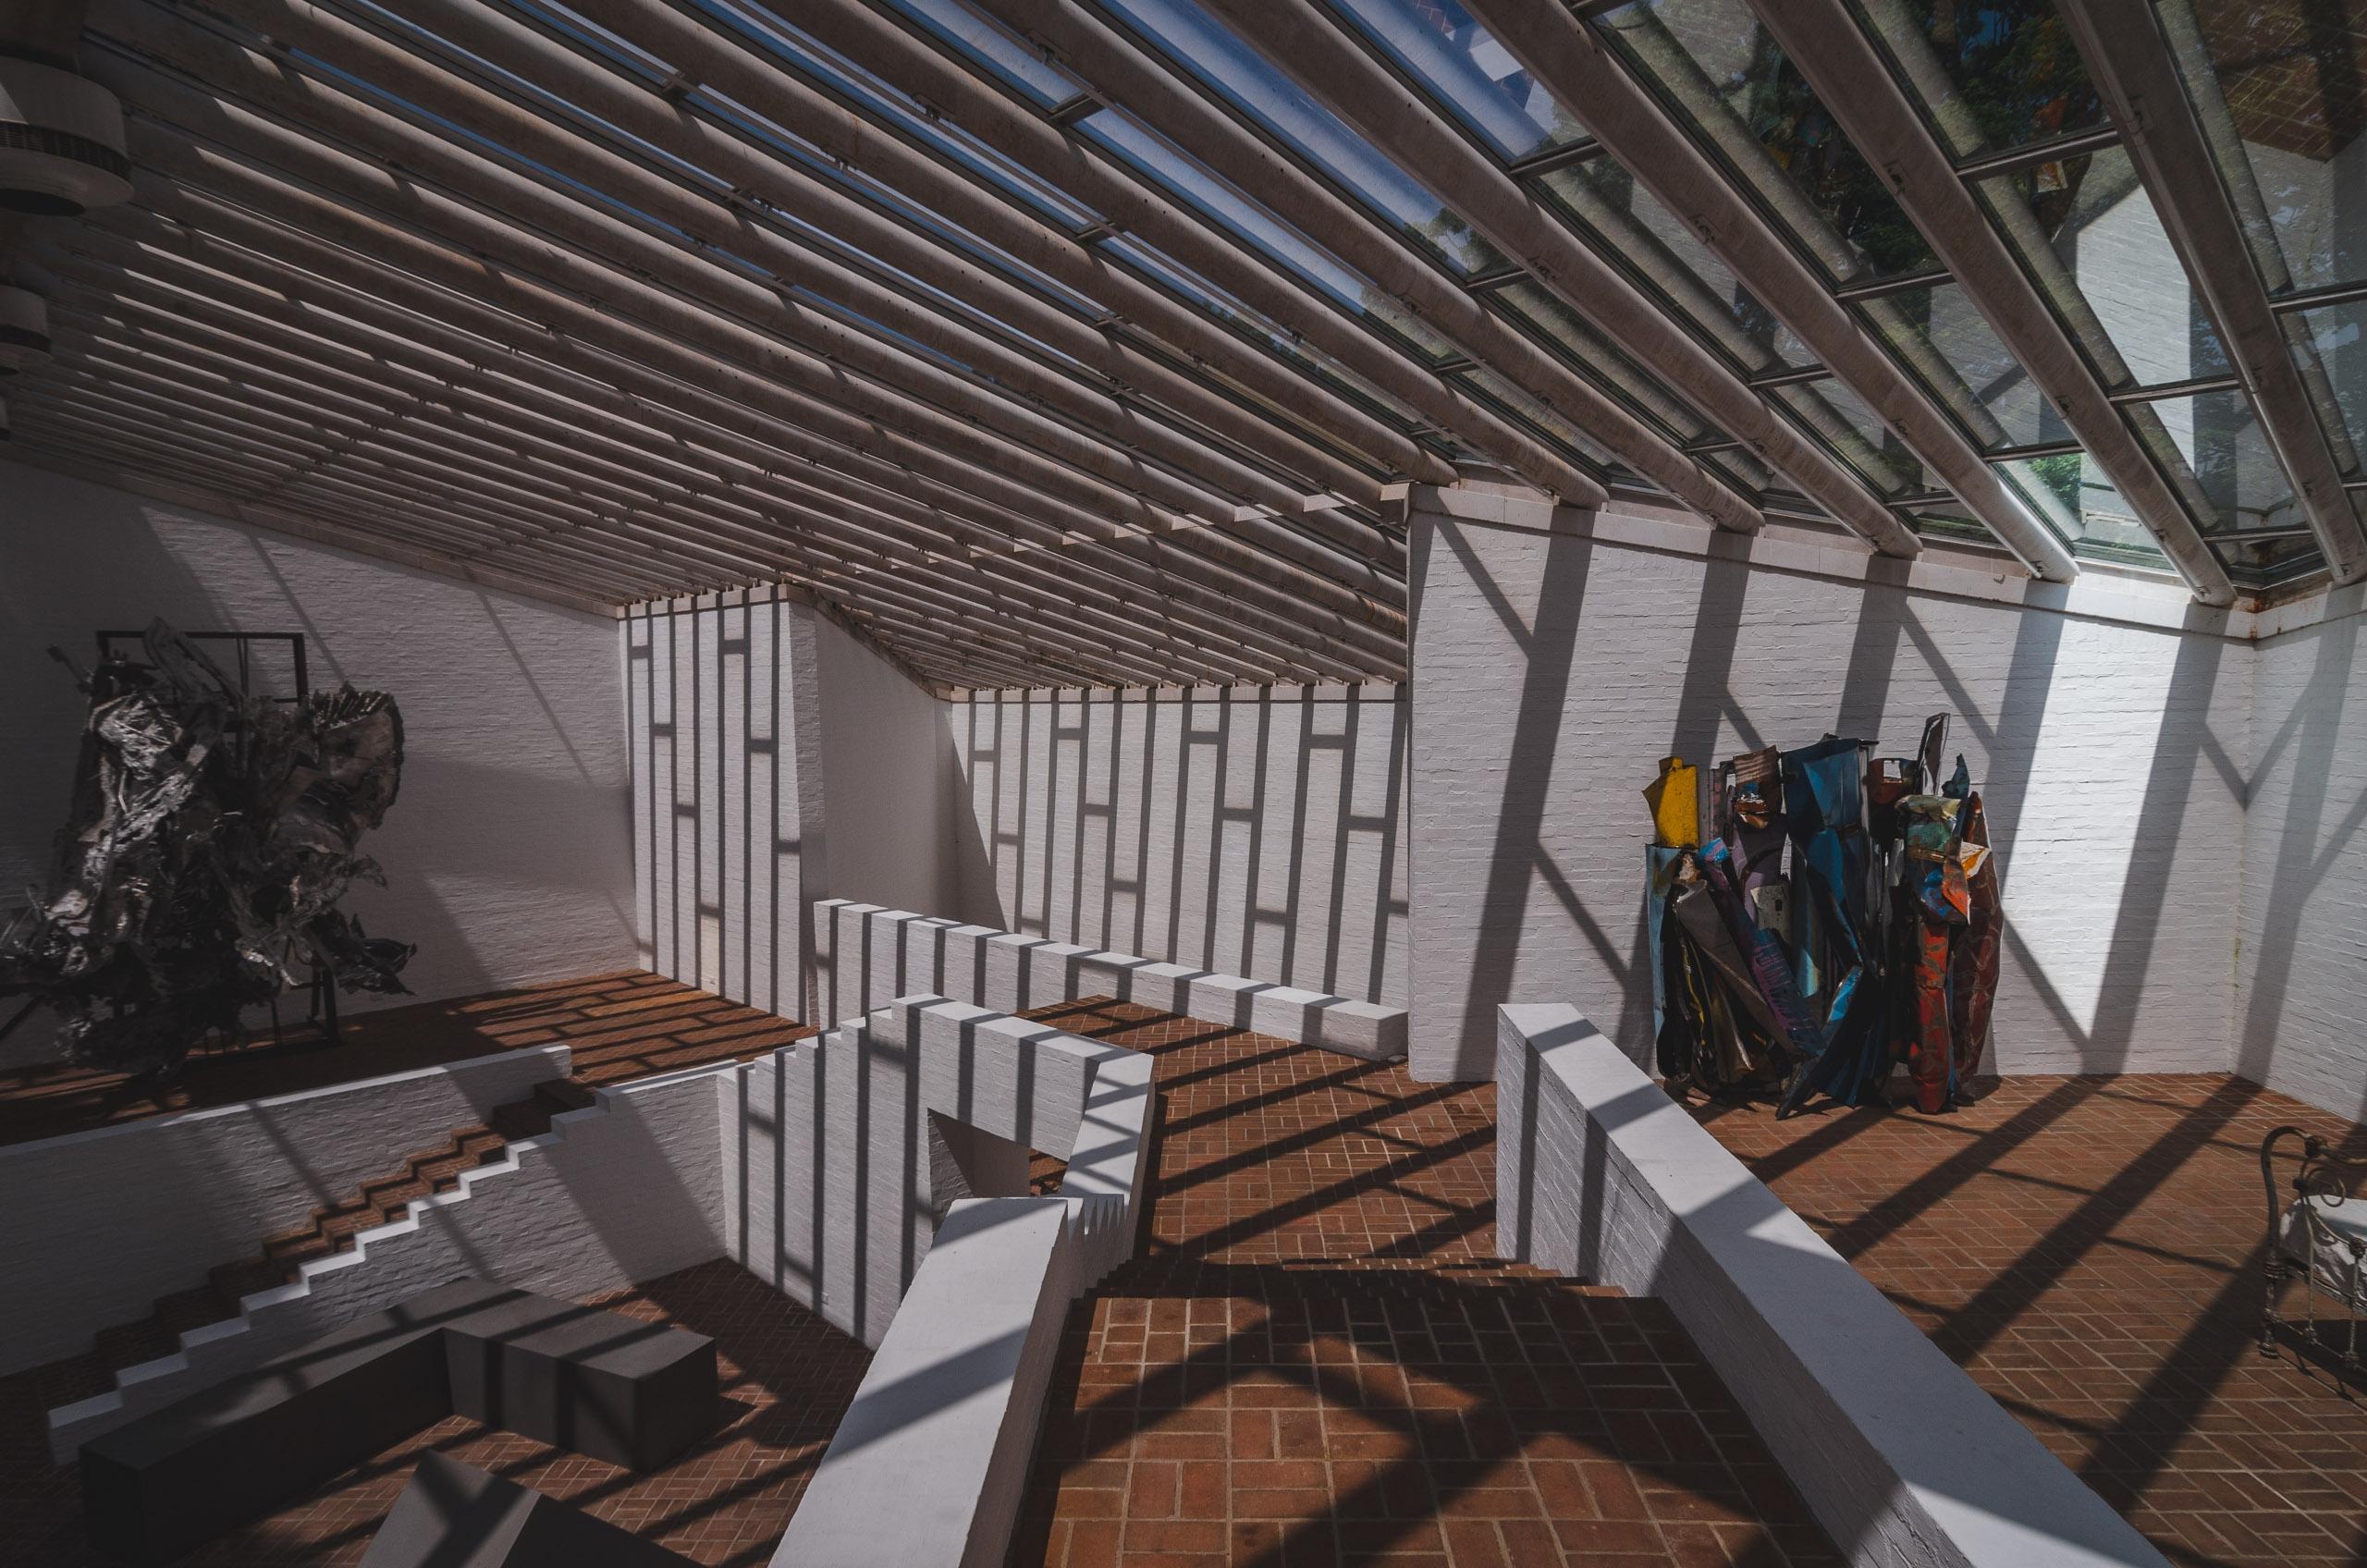 Inside the Gallery - Wide